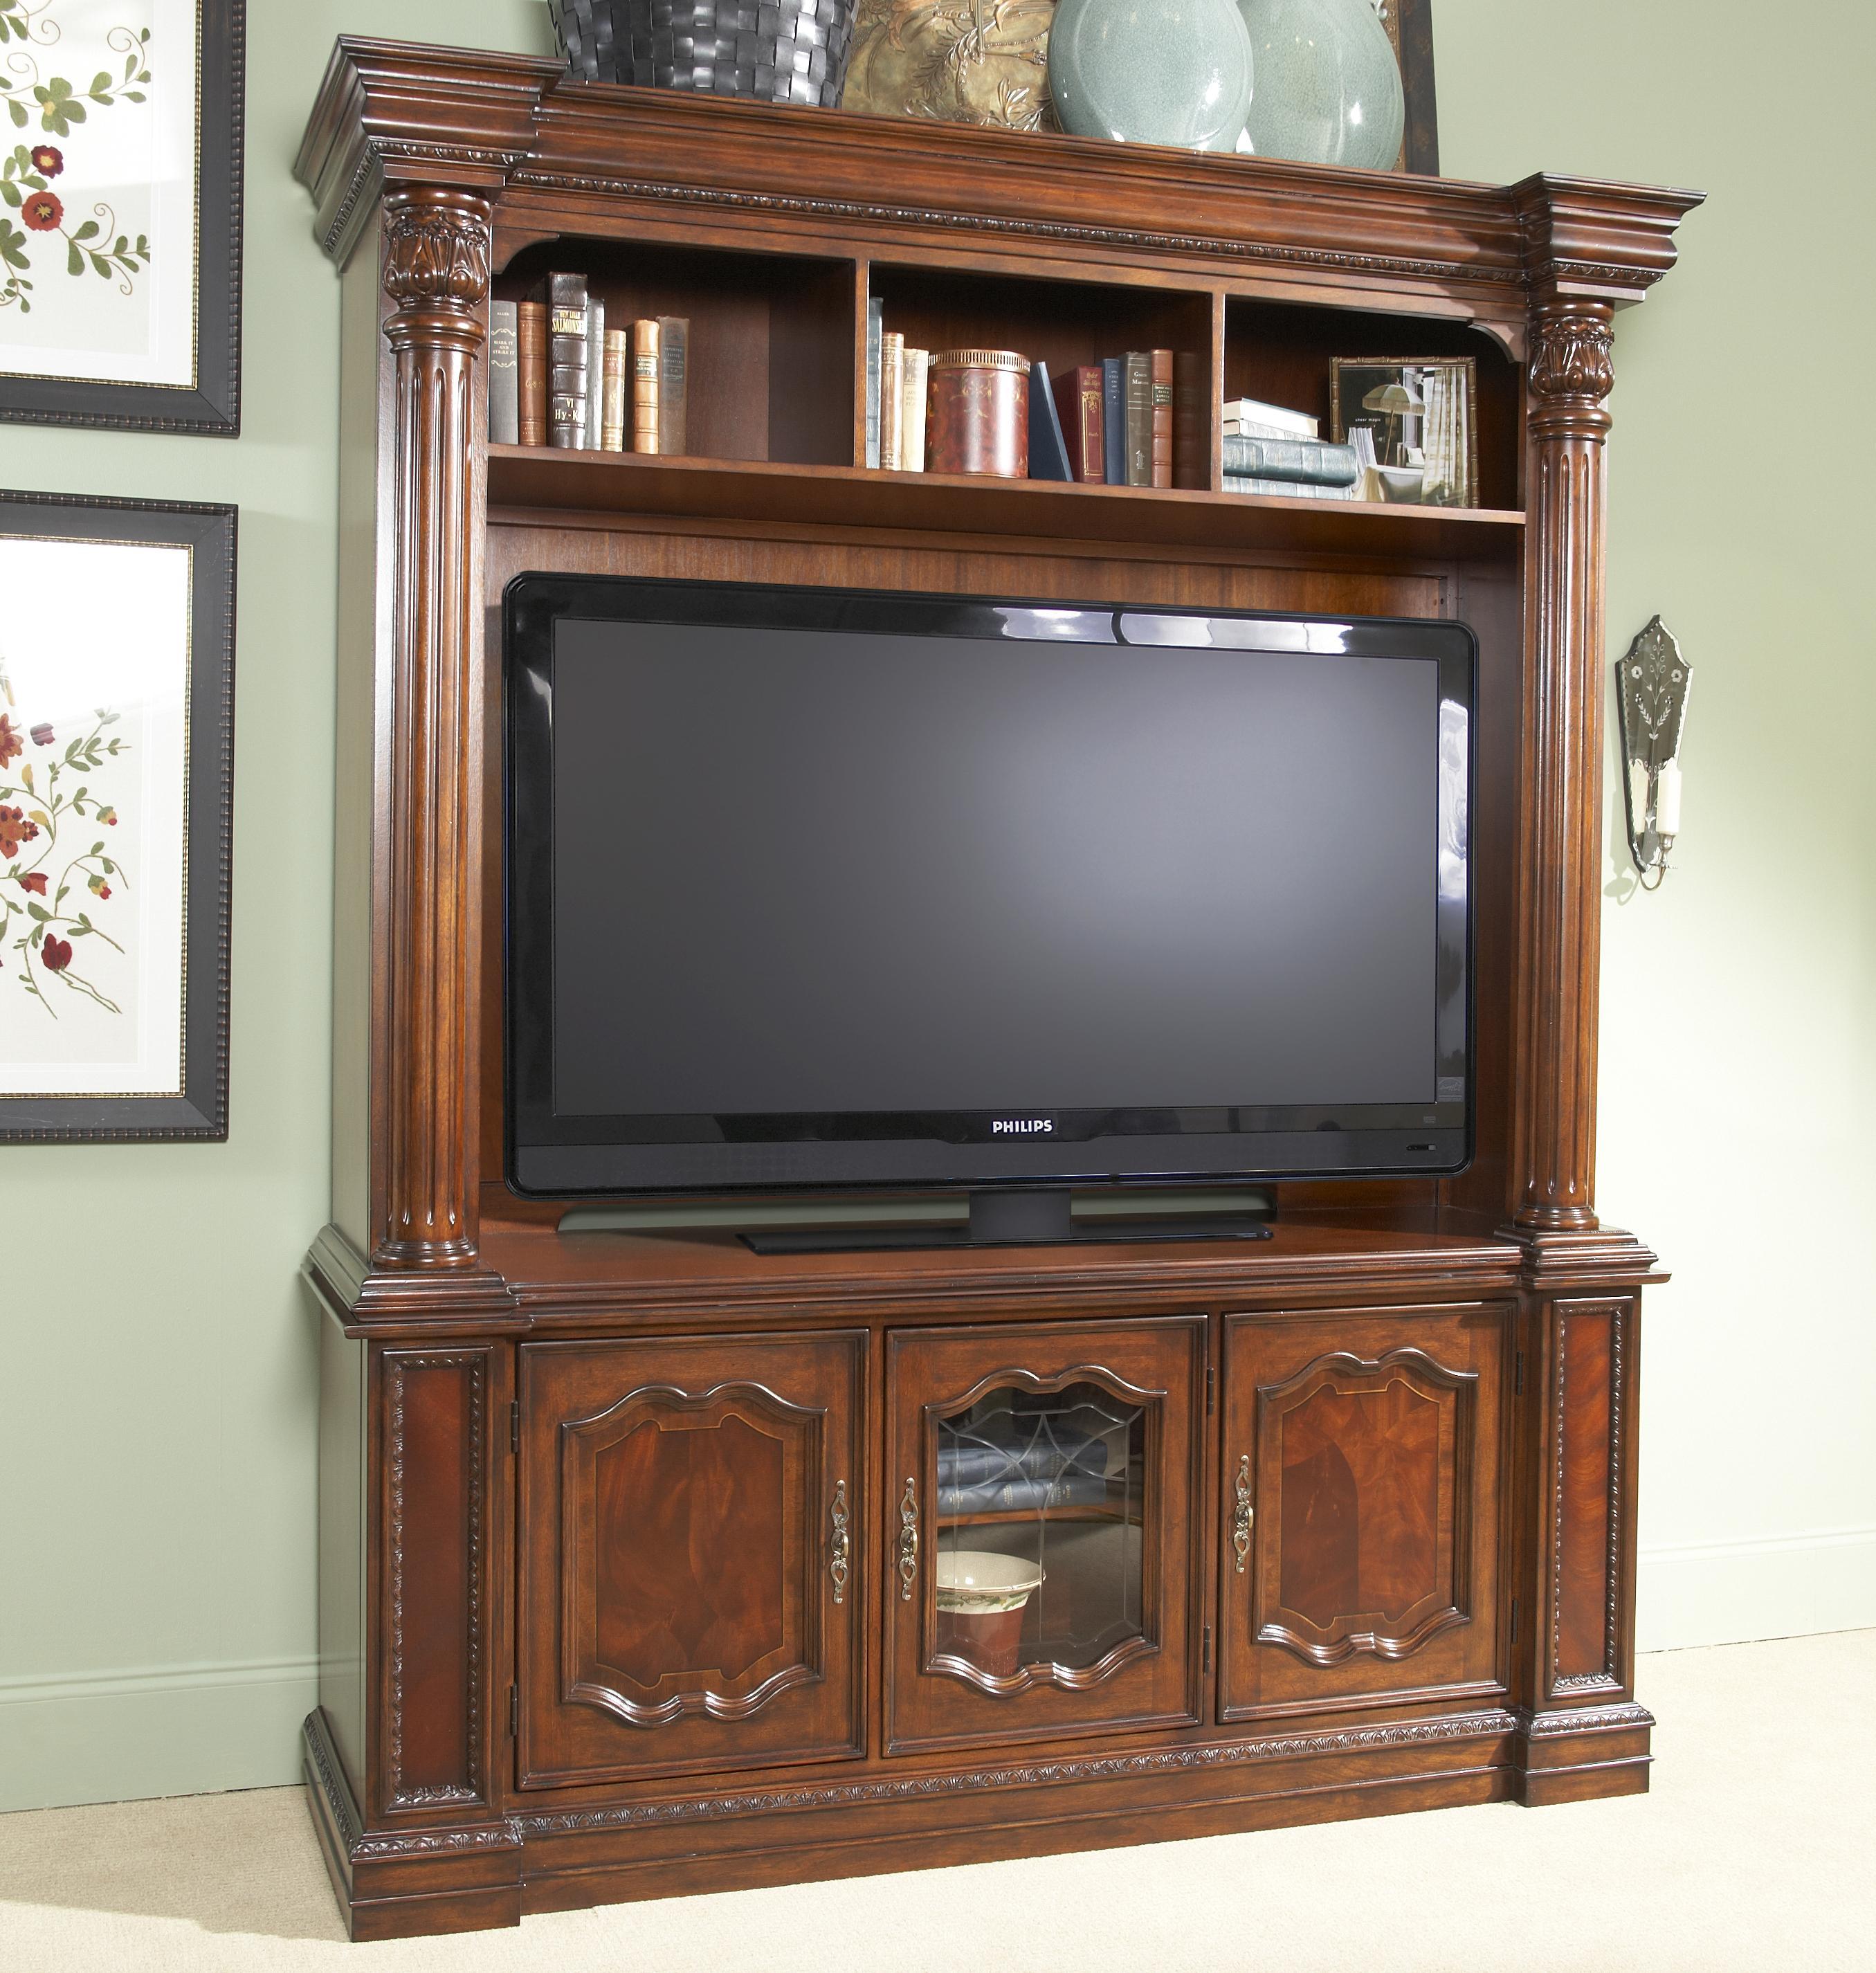 Entertainment Center Cabinet With Several Unique Storage Features